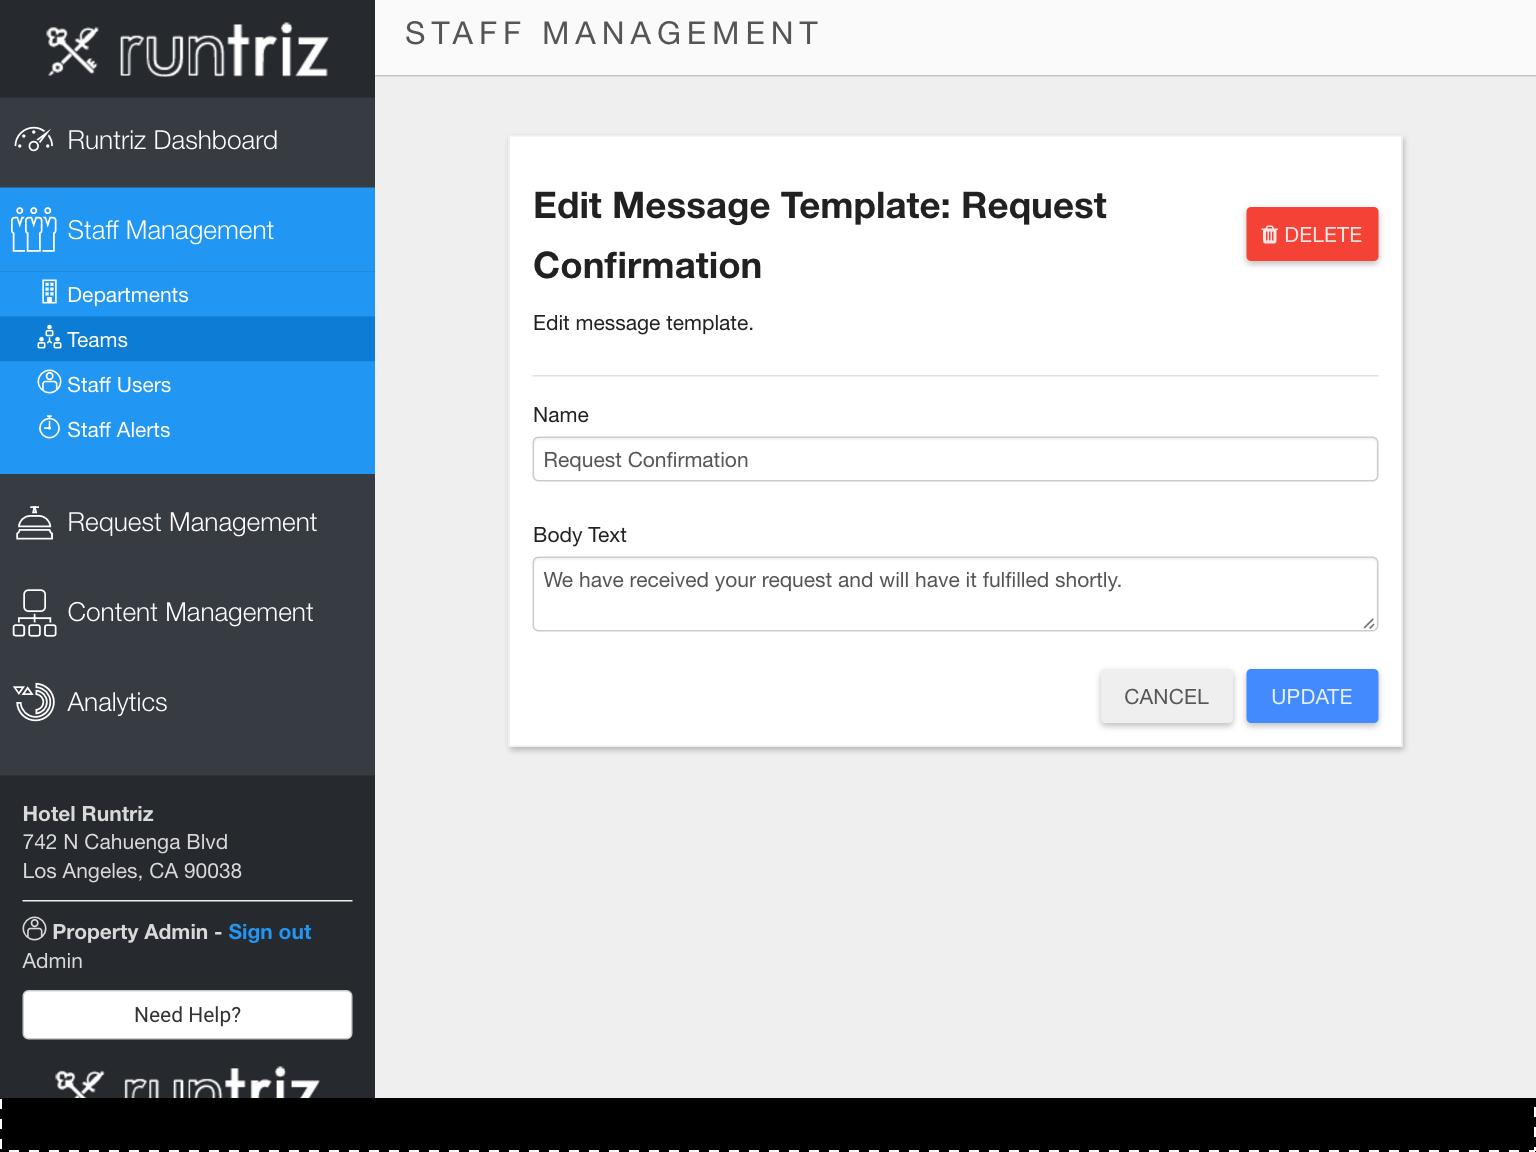 Advanced Options - Messaging Templates